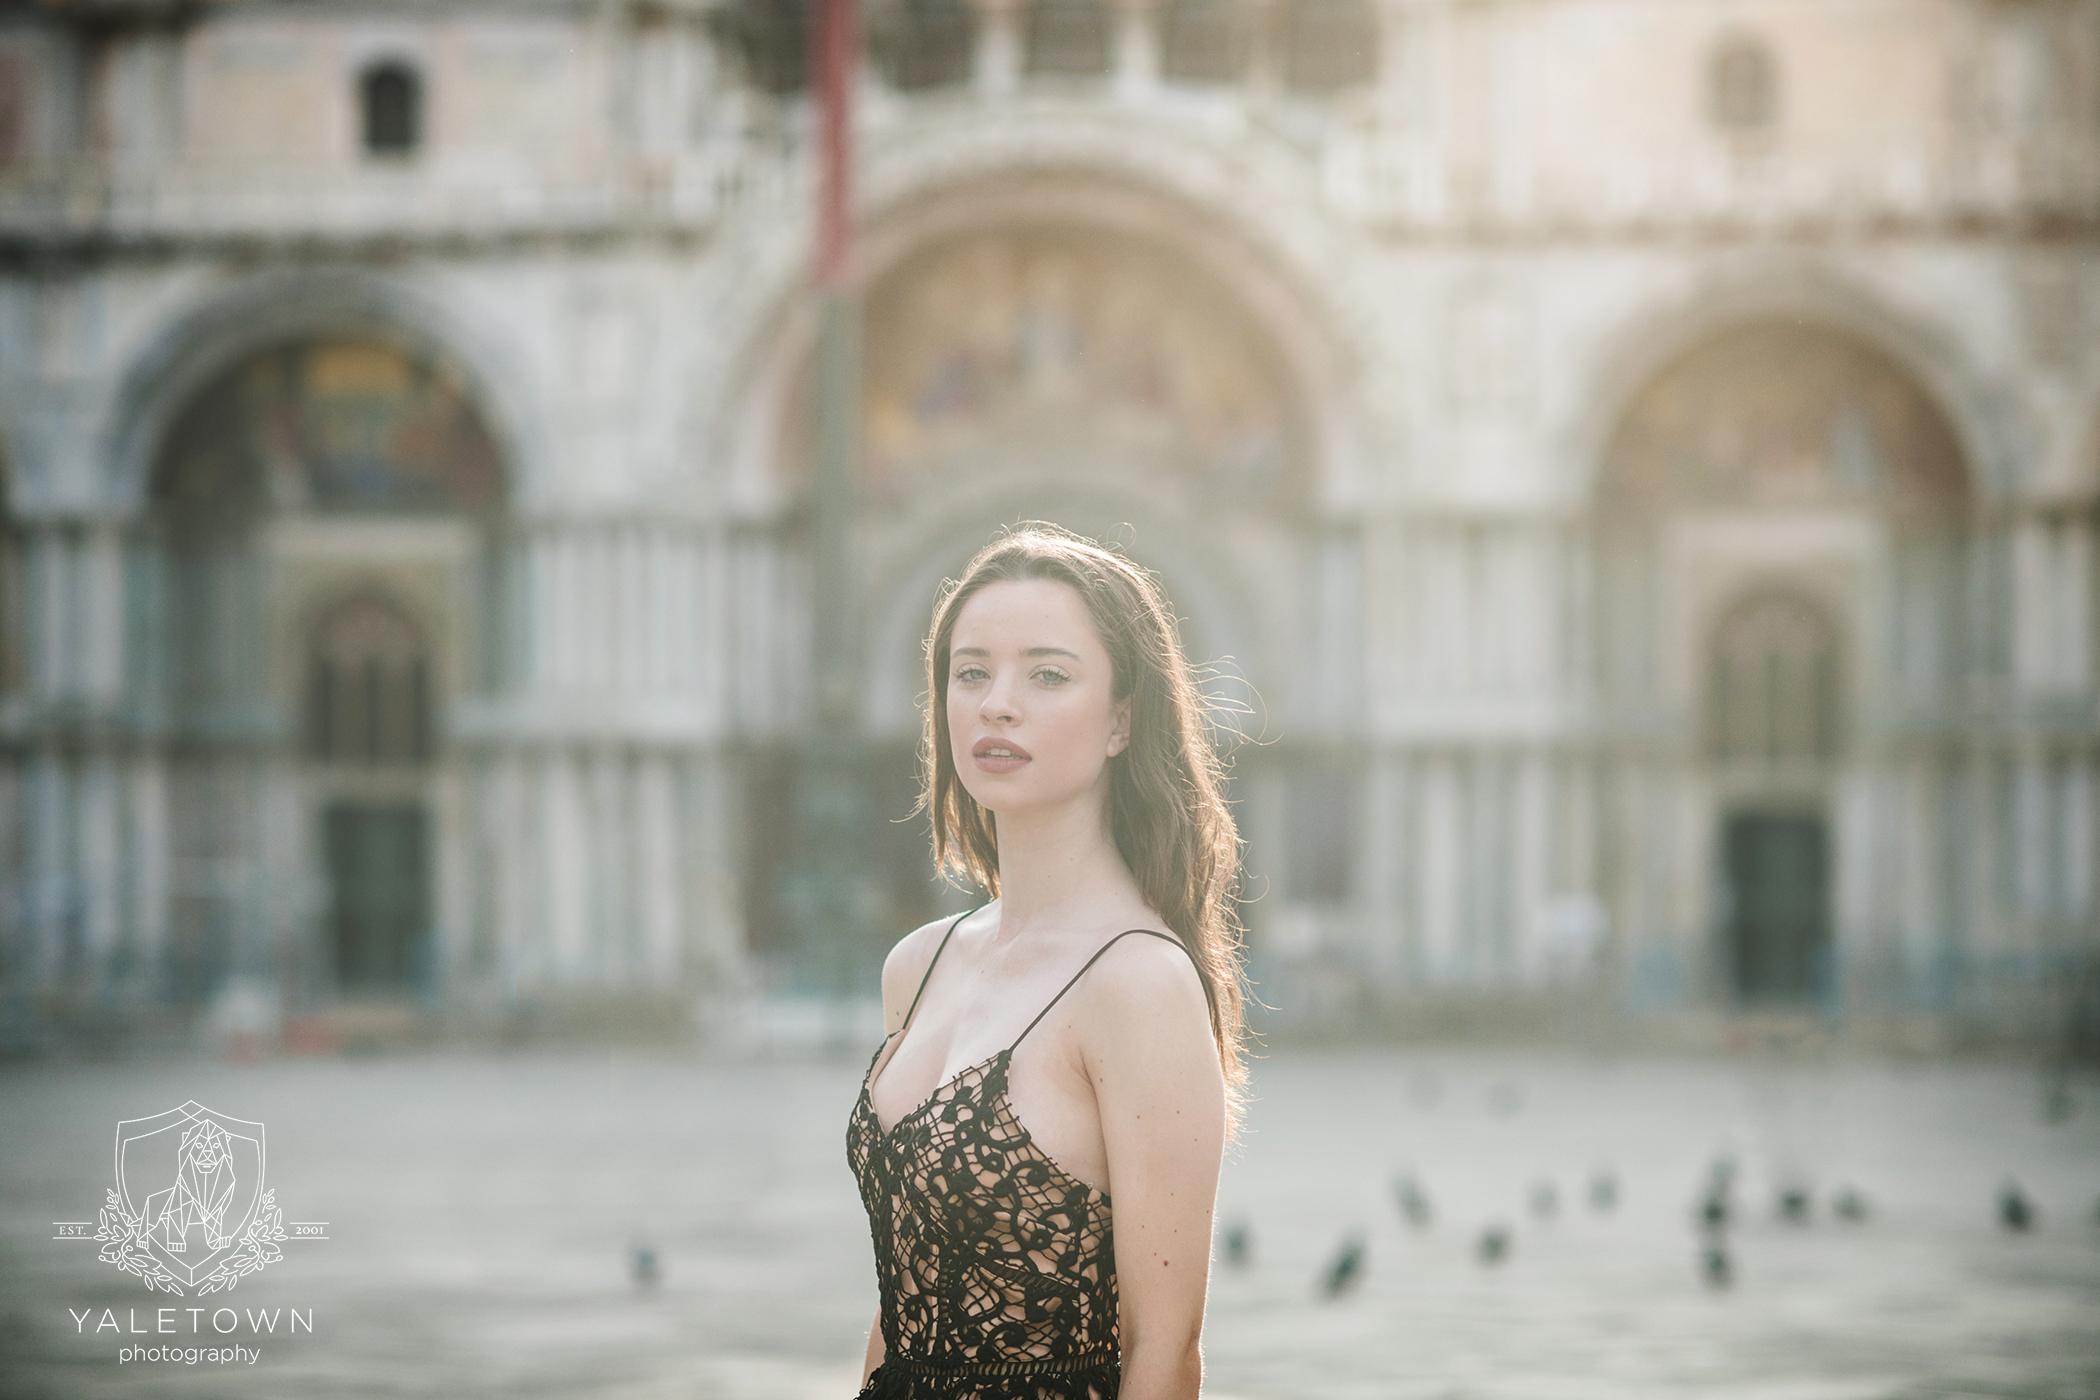 Venice-portrait-session-yaletown-photography-vacation-photographer-photo-005.jpg